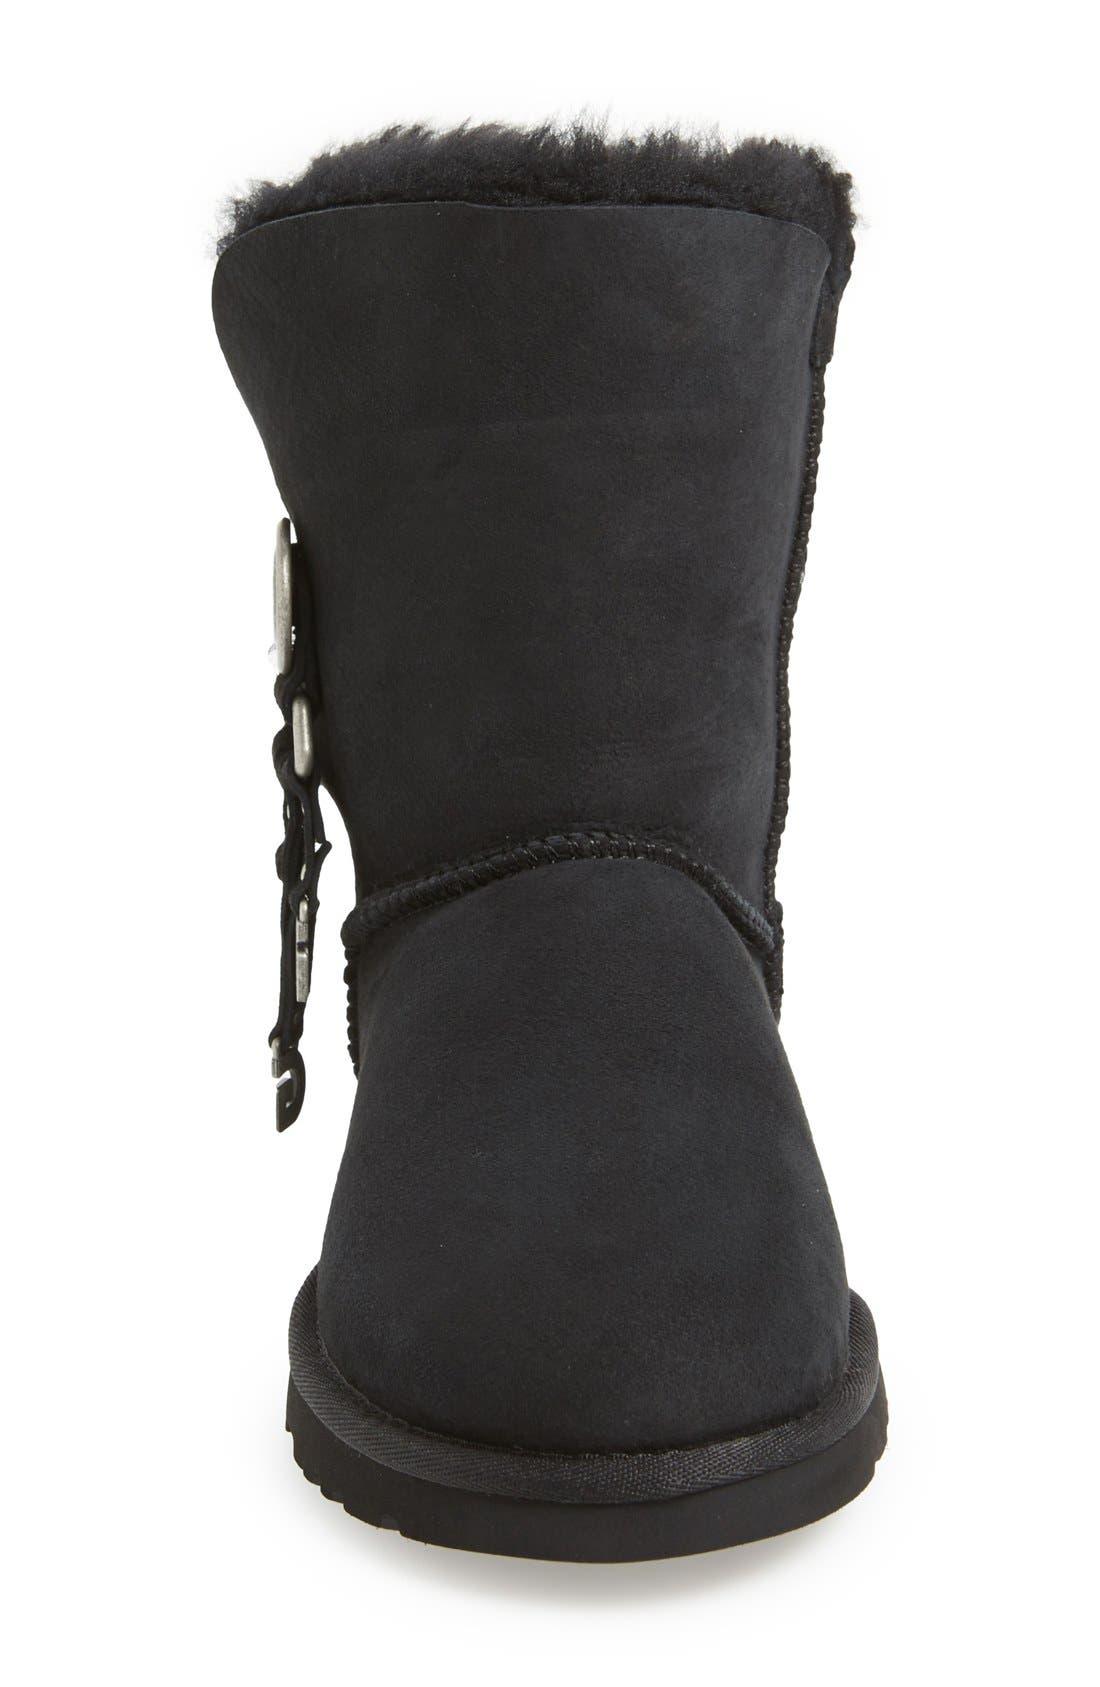 Australia 'Azalea Charm' Boot,                             Alternate thumbnail 5, color,                             001